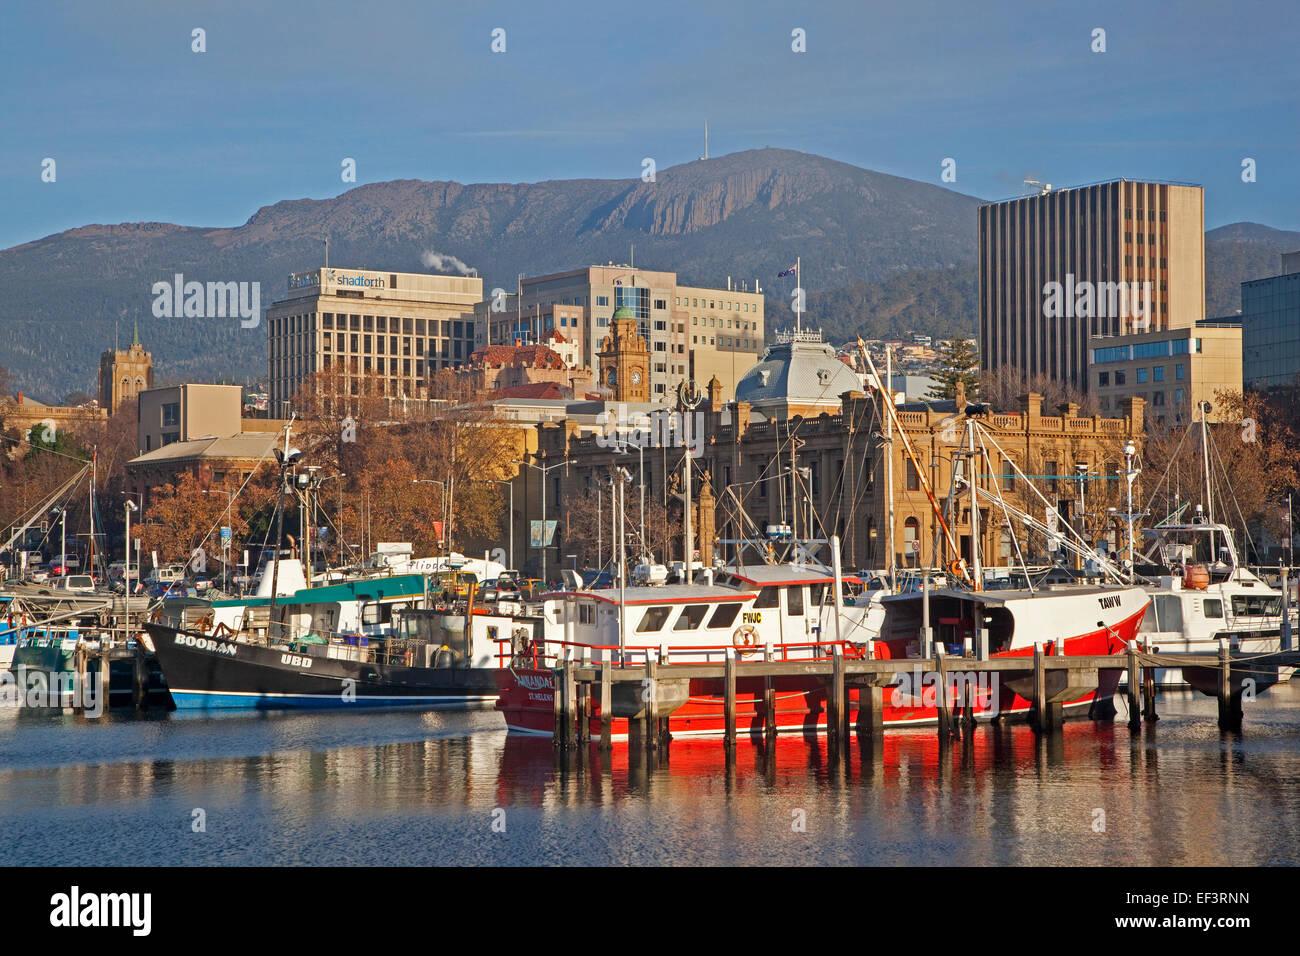 Fishing boats docked in the Hobart harbour, Tasmania, Australia - Stock Image